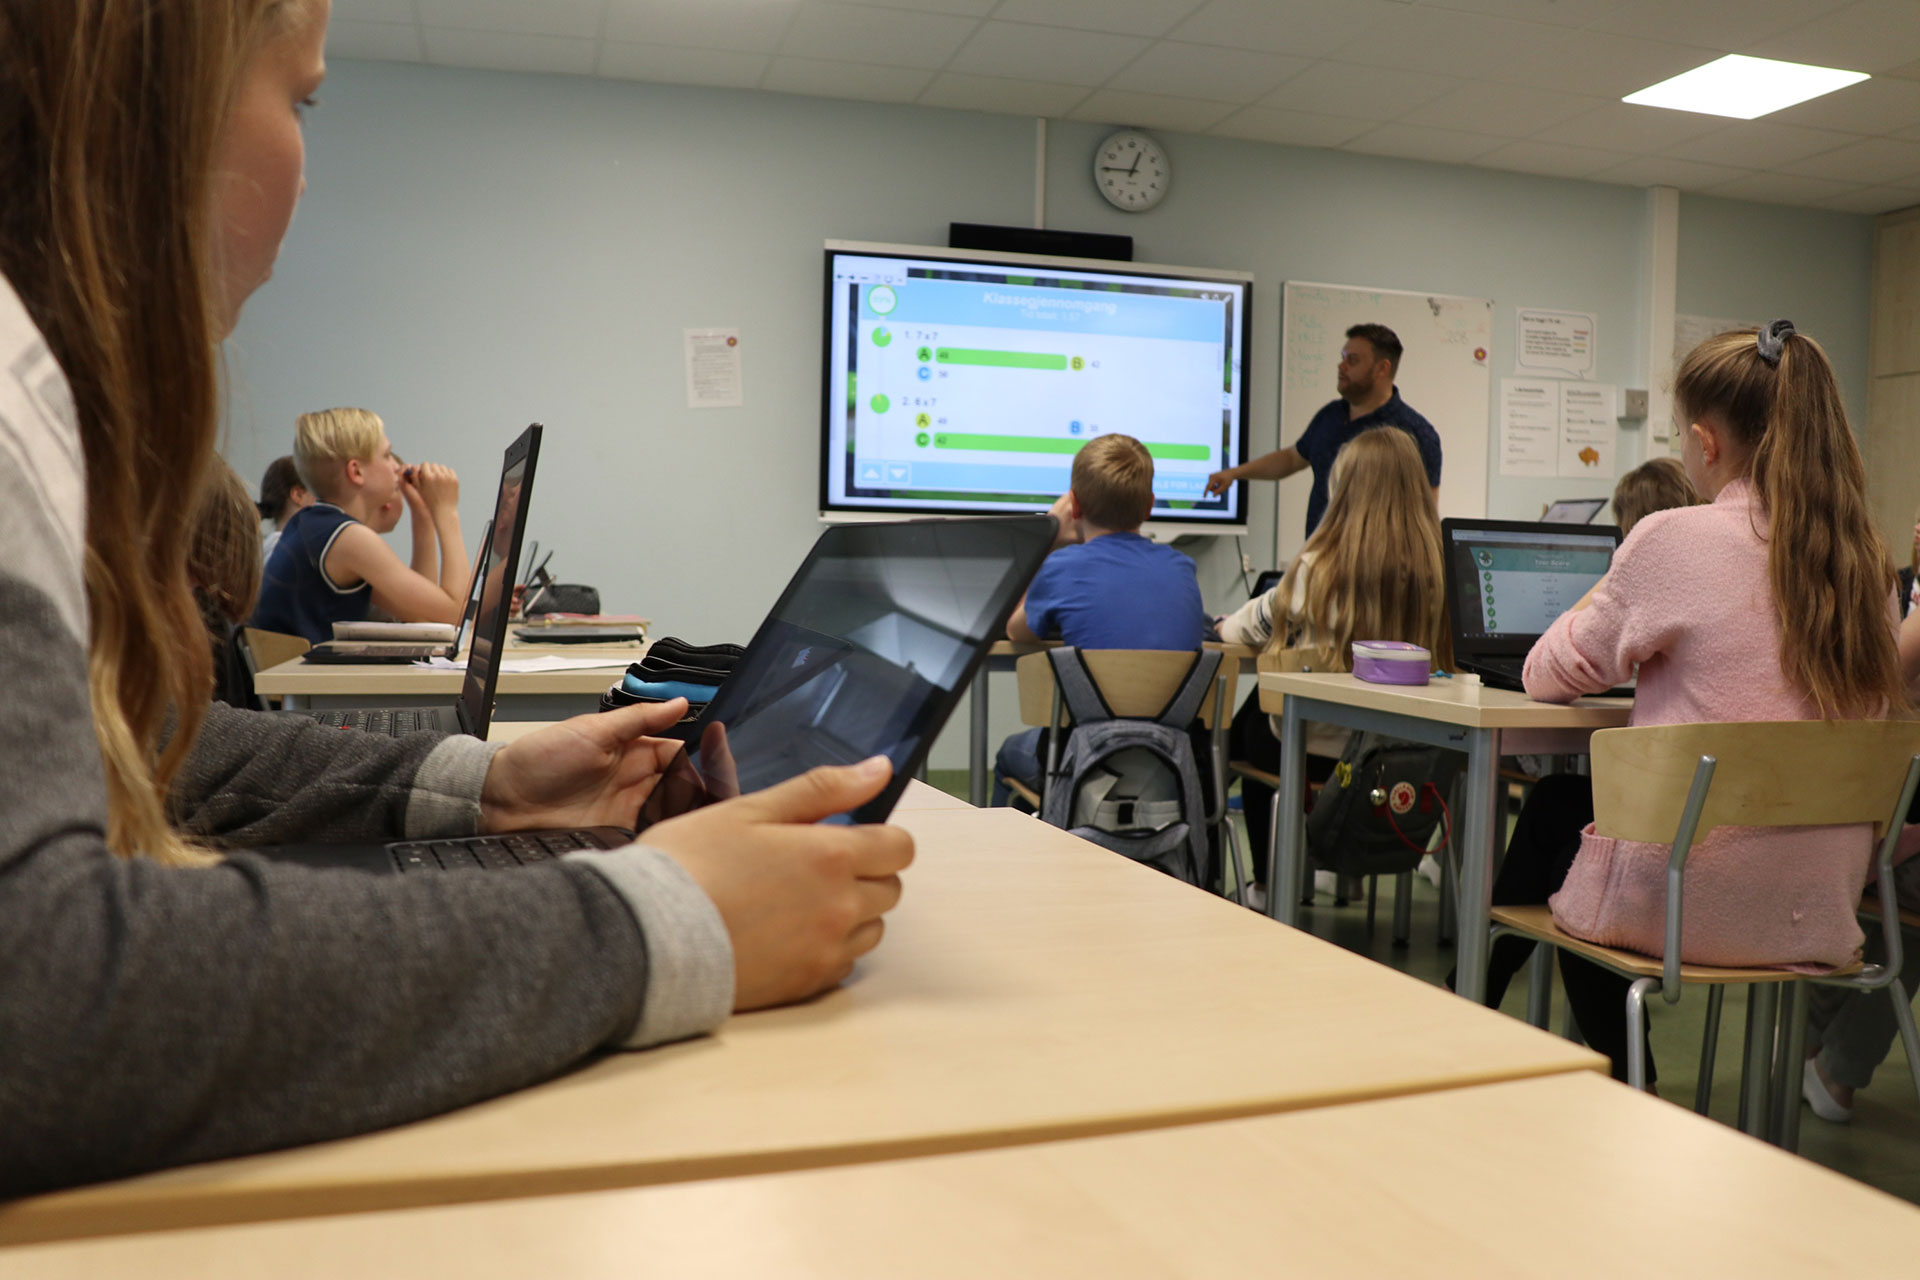 Klasseromsundervisning-smart